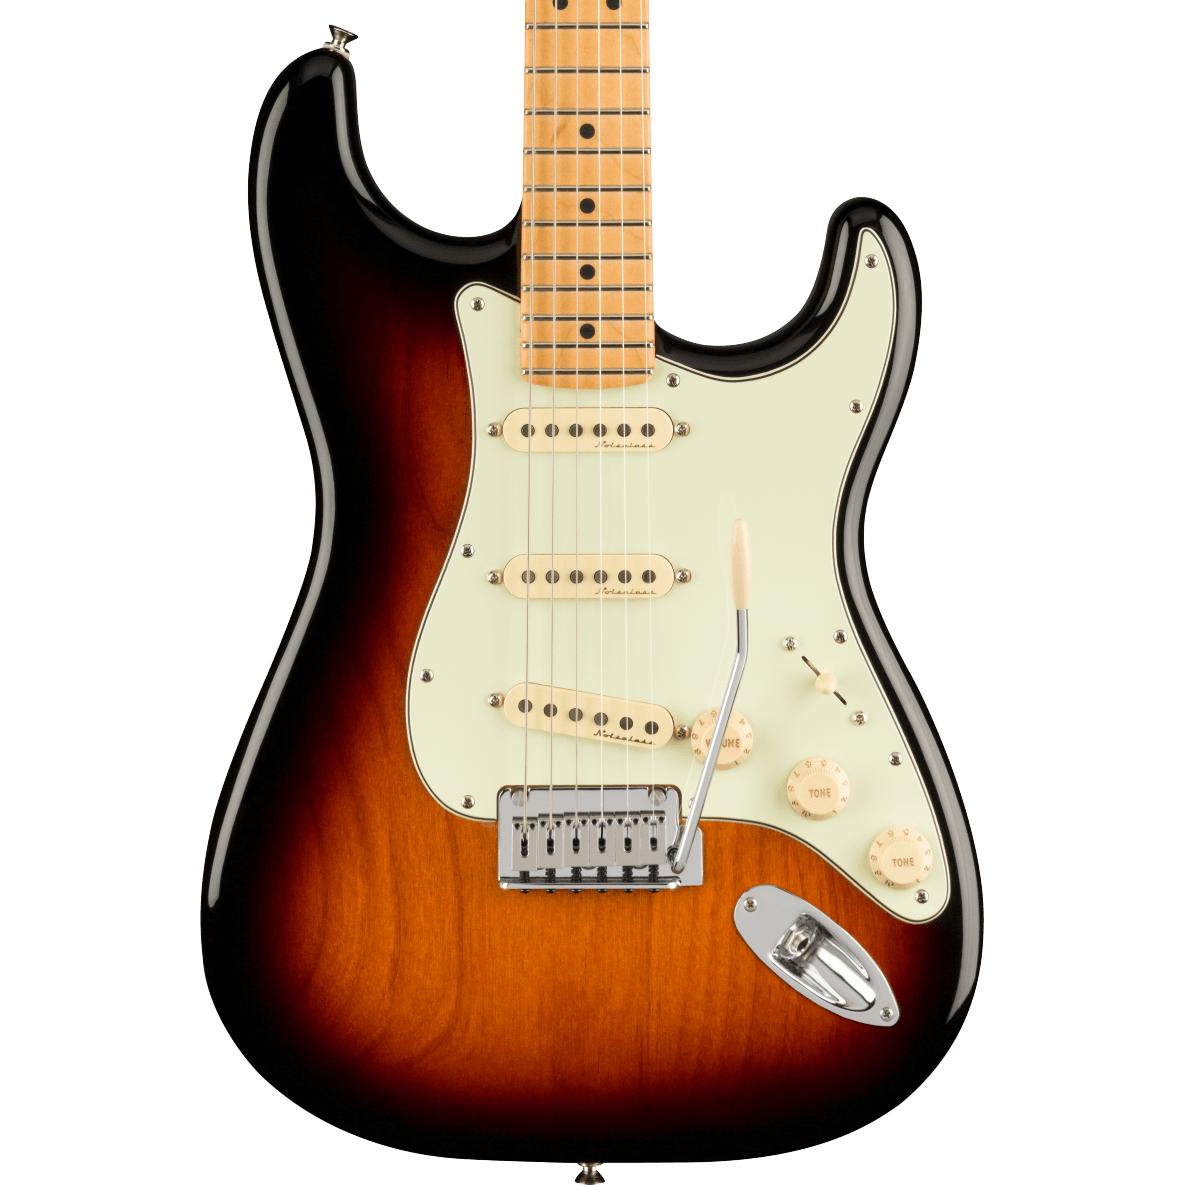 Fender Player Plus Stratocaster - Maple Fingerboard, 3-Color Sunburst